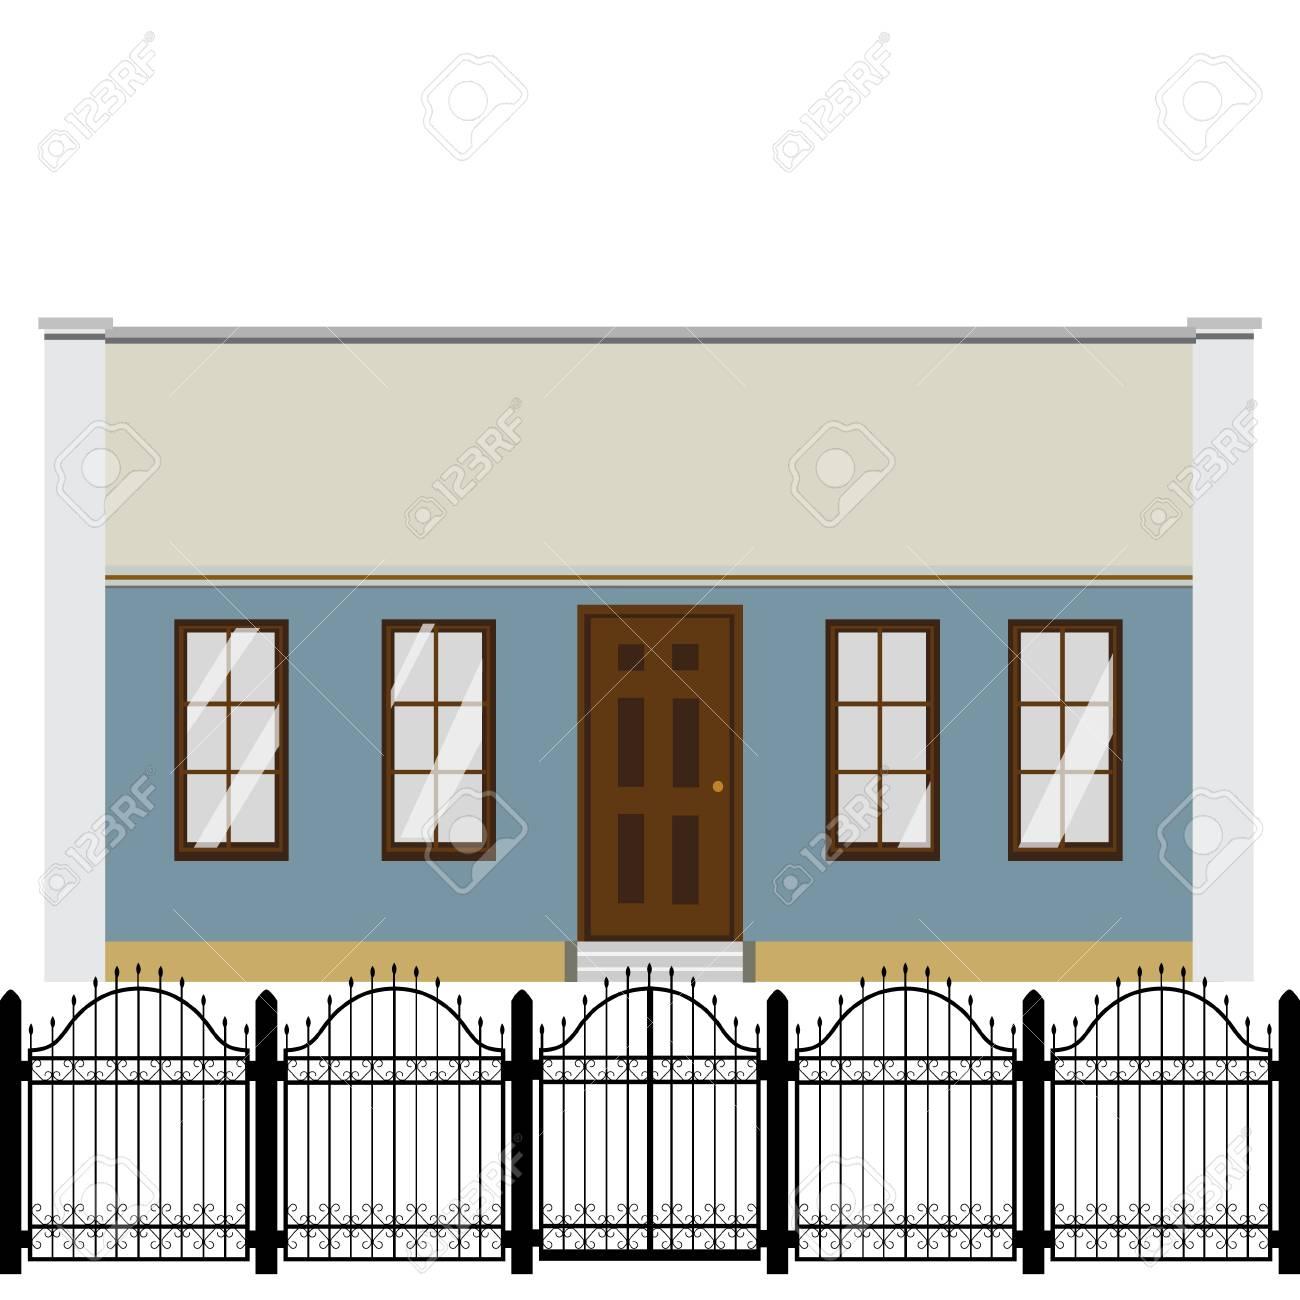 Raster Illustration Hausfassade Wohnhaus Mit Modularem Gelander Des